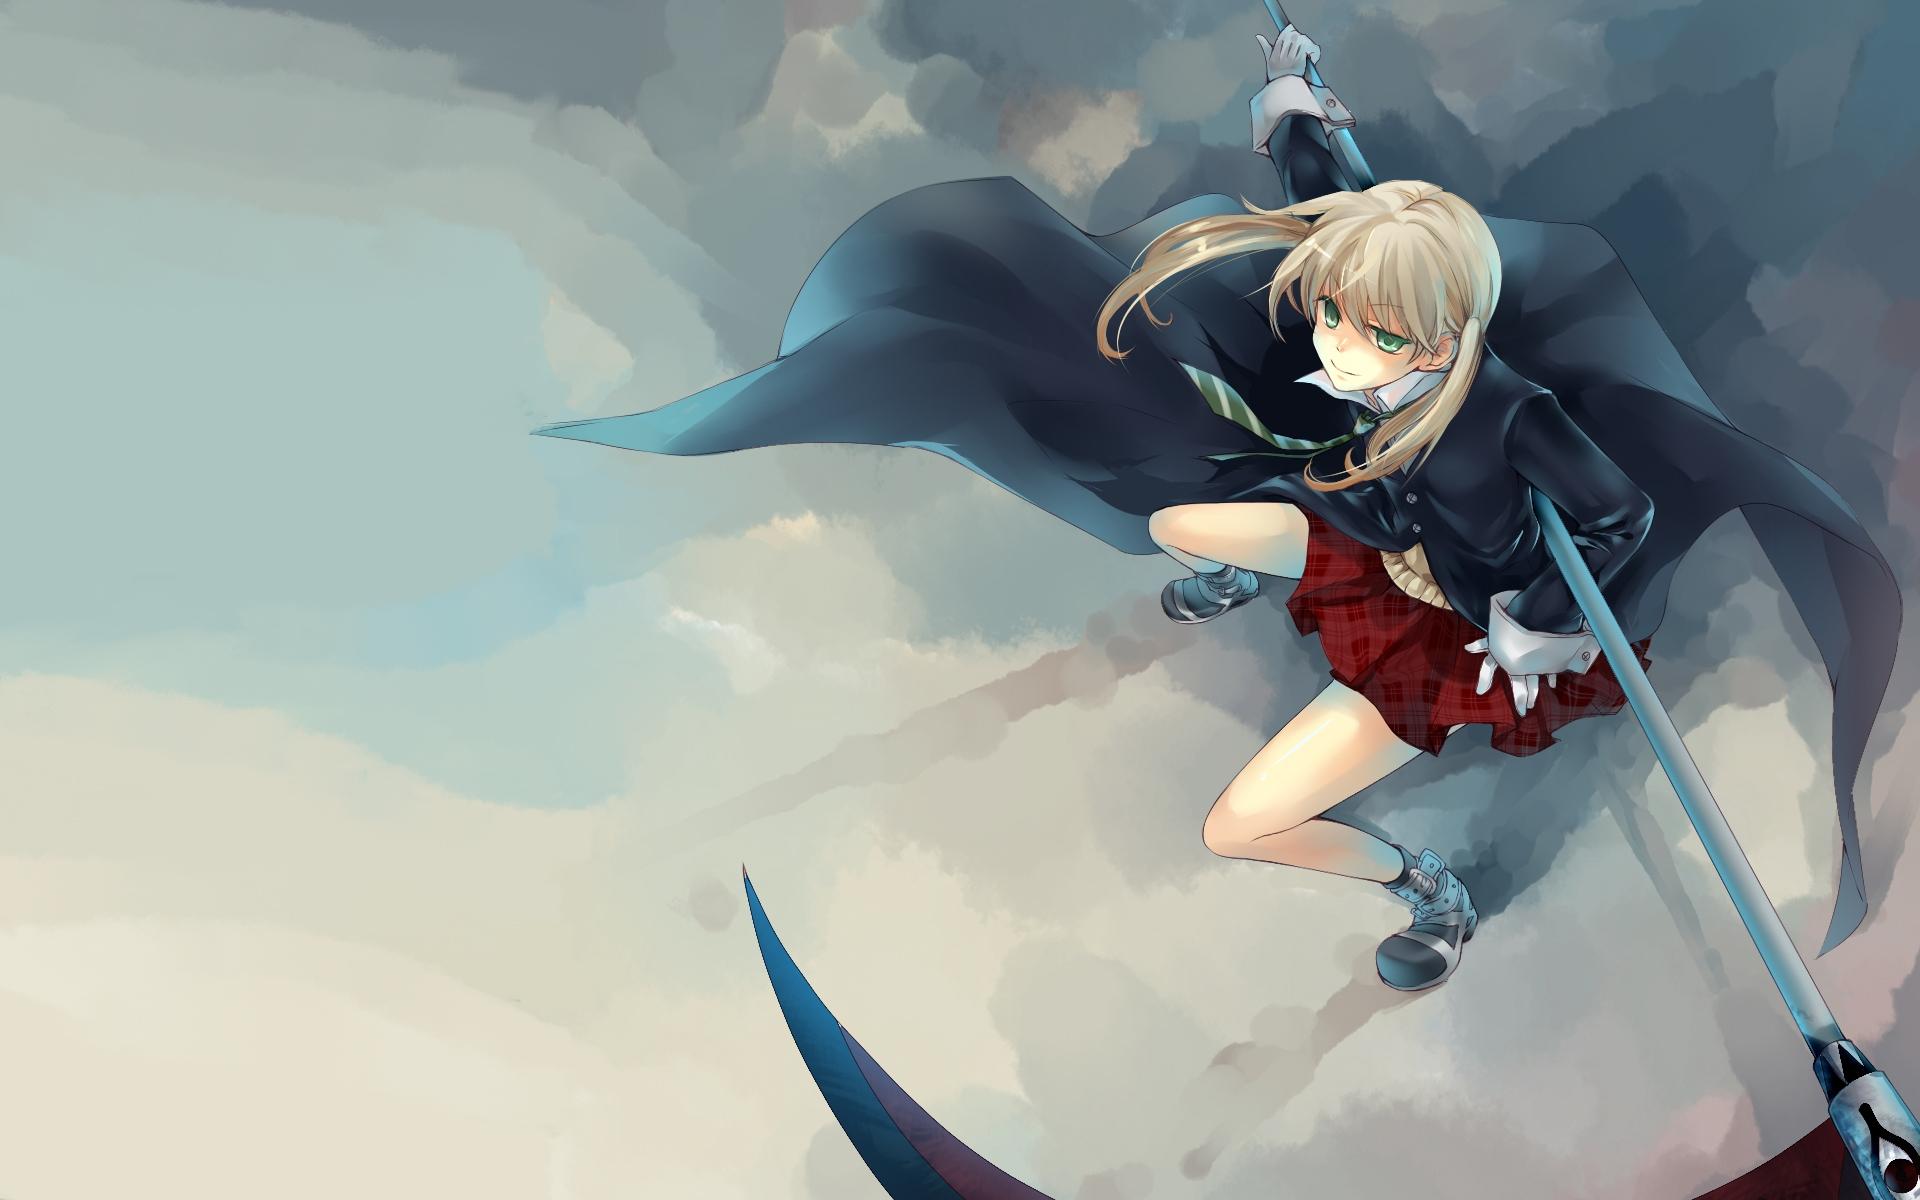 Wallpaper Anime Sky Air Girl Coat Commitment Computer